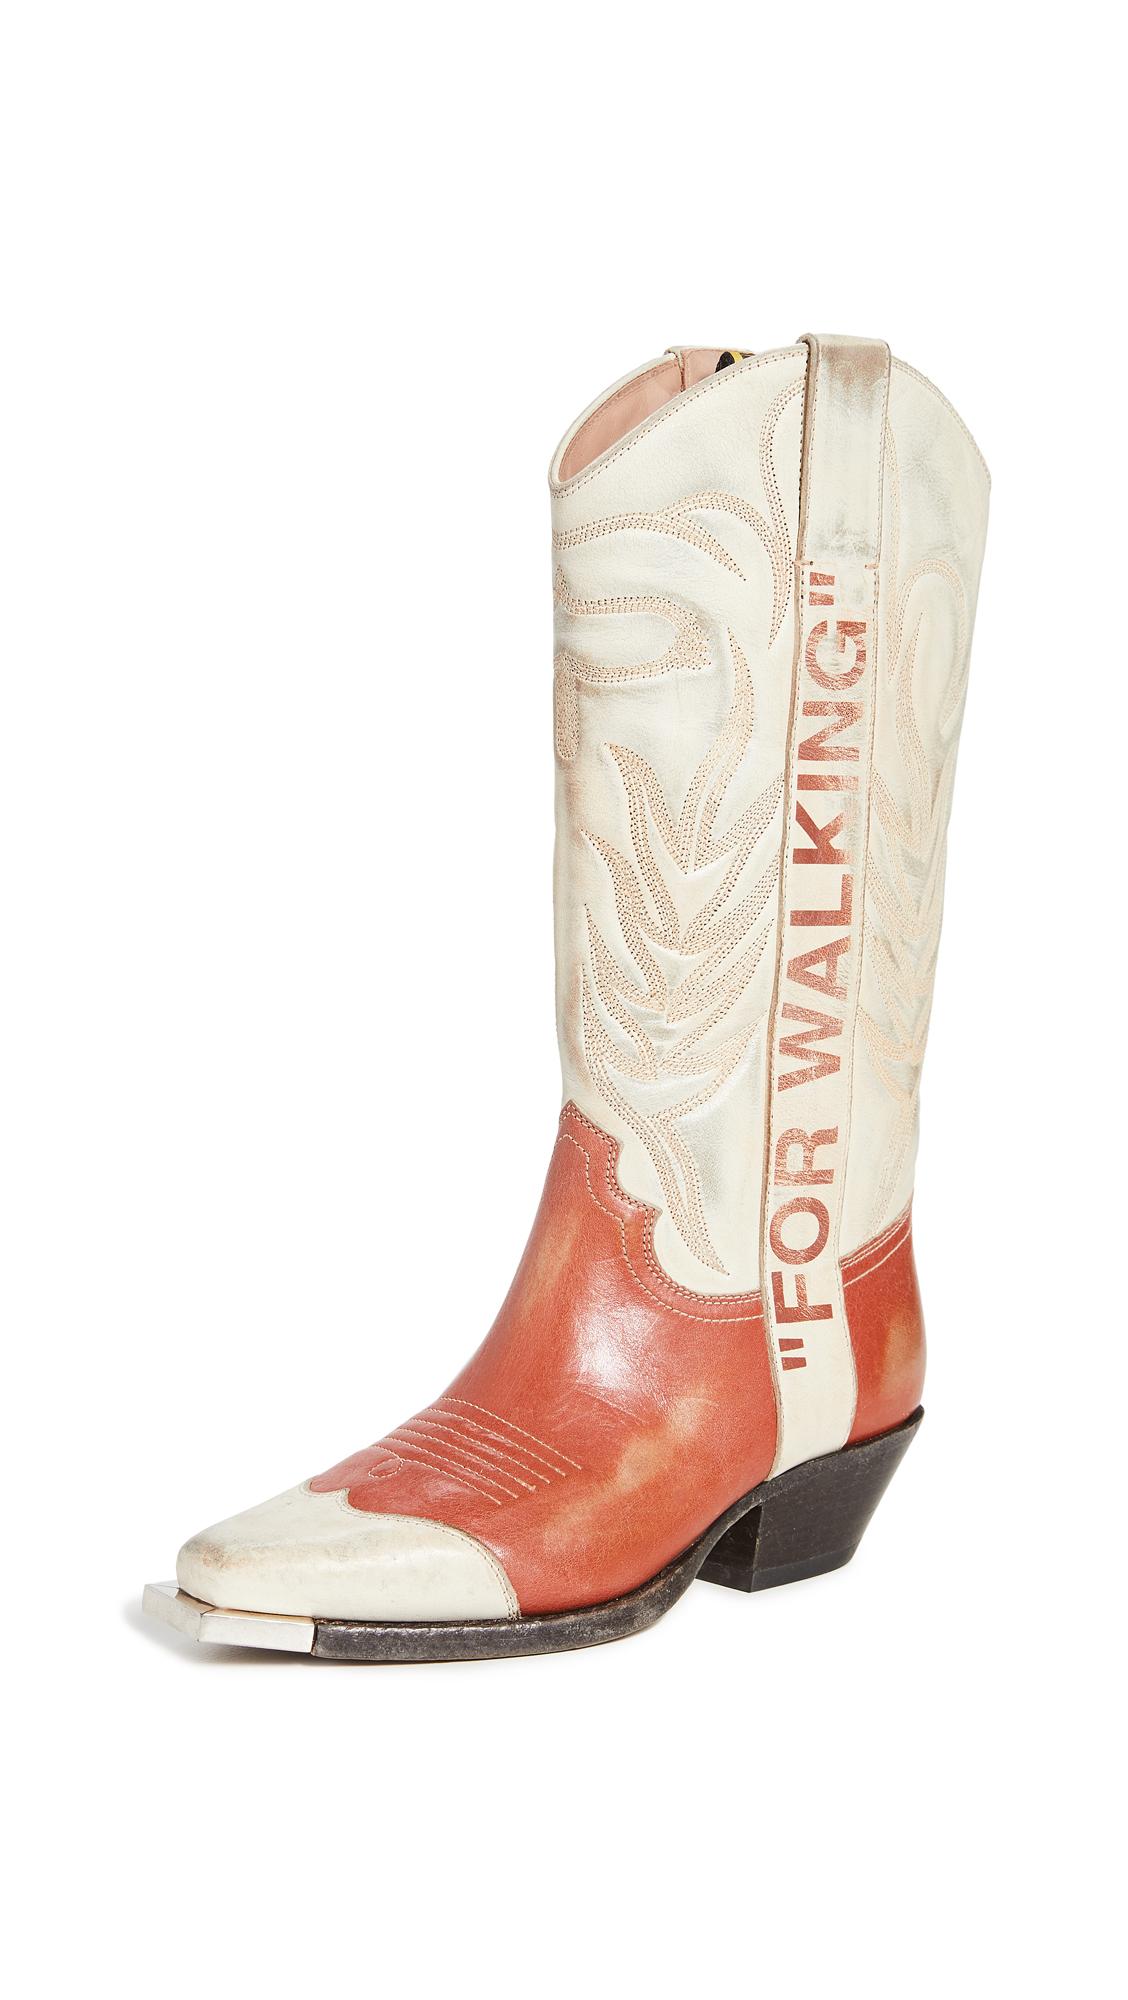 Off-White Vintage Cowboy Boots – 60% Off Sale